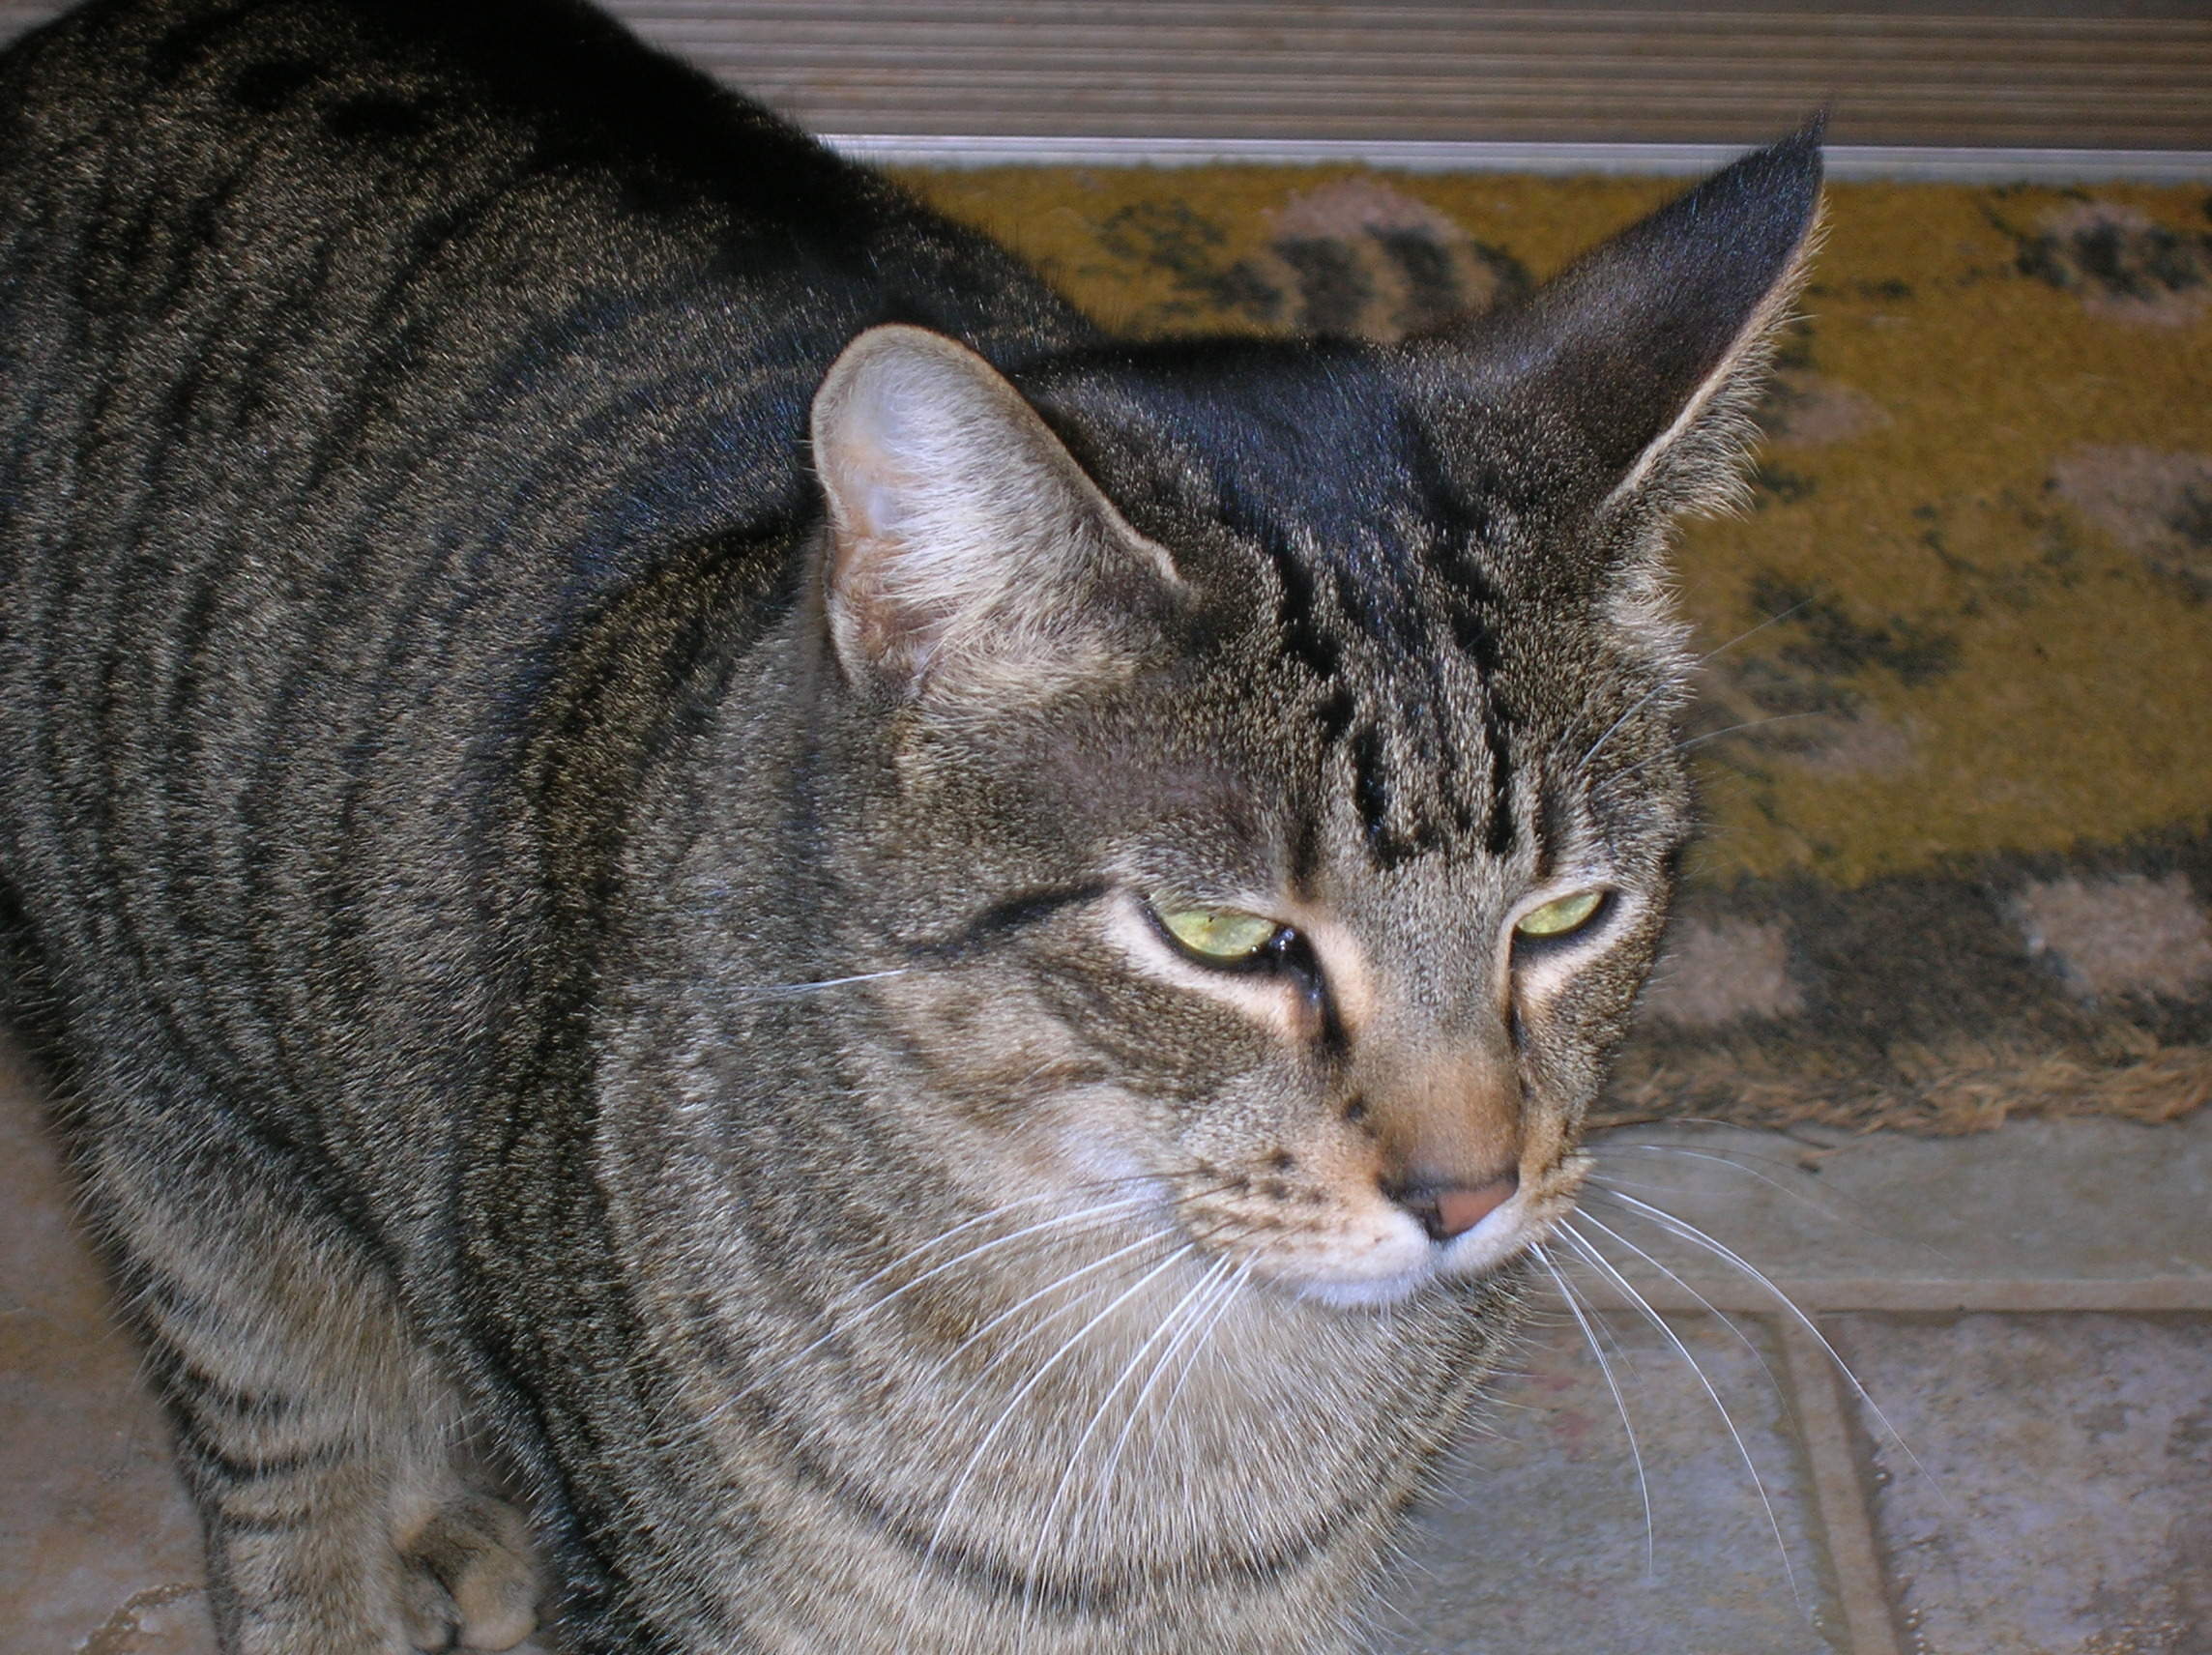 File:Tabby-cat.jpg - Wikipedia Tabby Cat